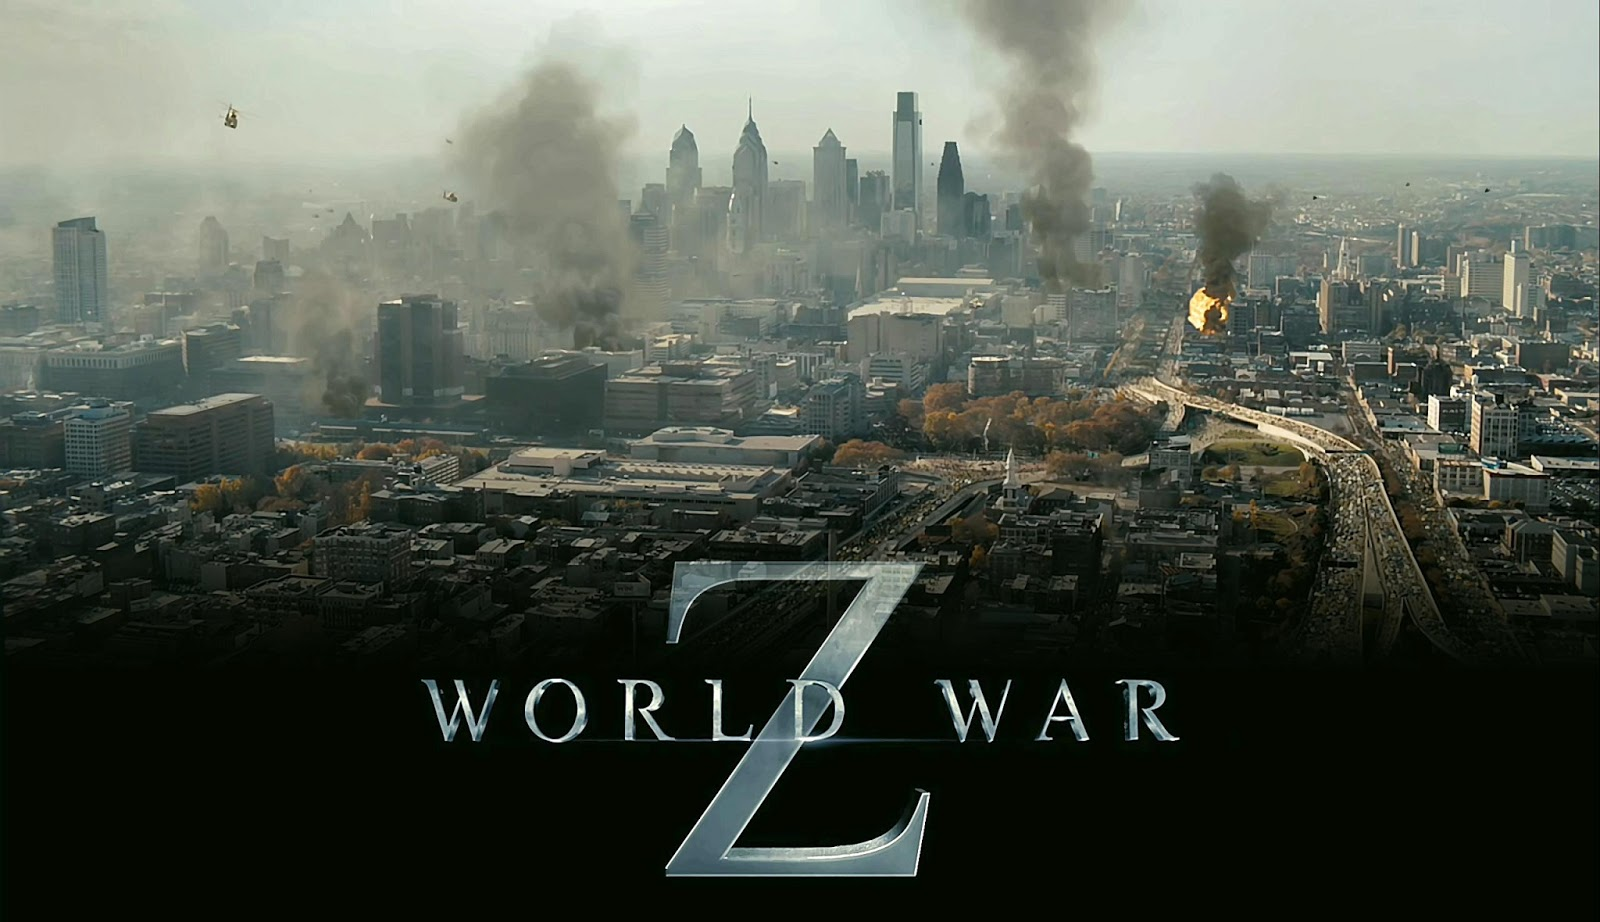 http://3.bp.blogspot.com/-U1G5D50sCYs/UXm2ynKY4CI/AAAAAAAAADc/uN8fD86vLXI/s1600/world-war-z-film.jpg